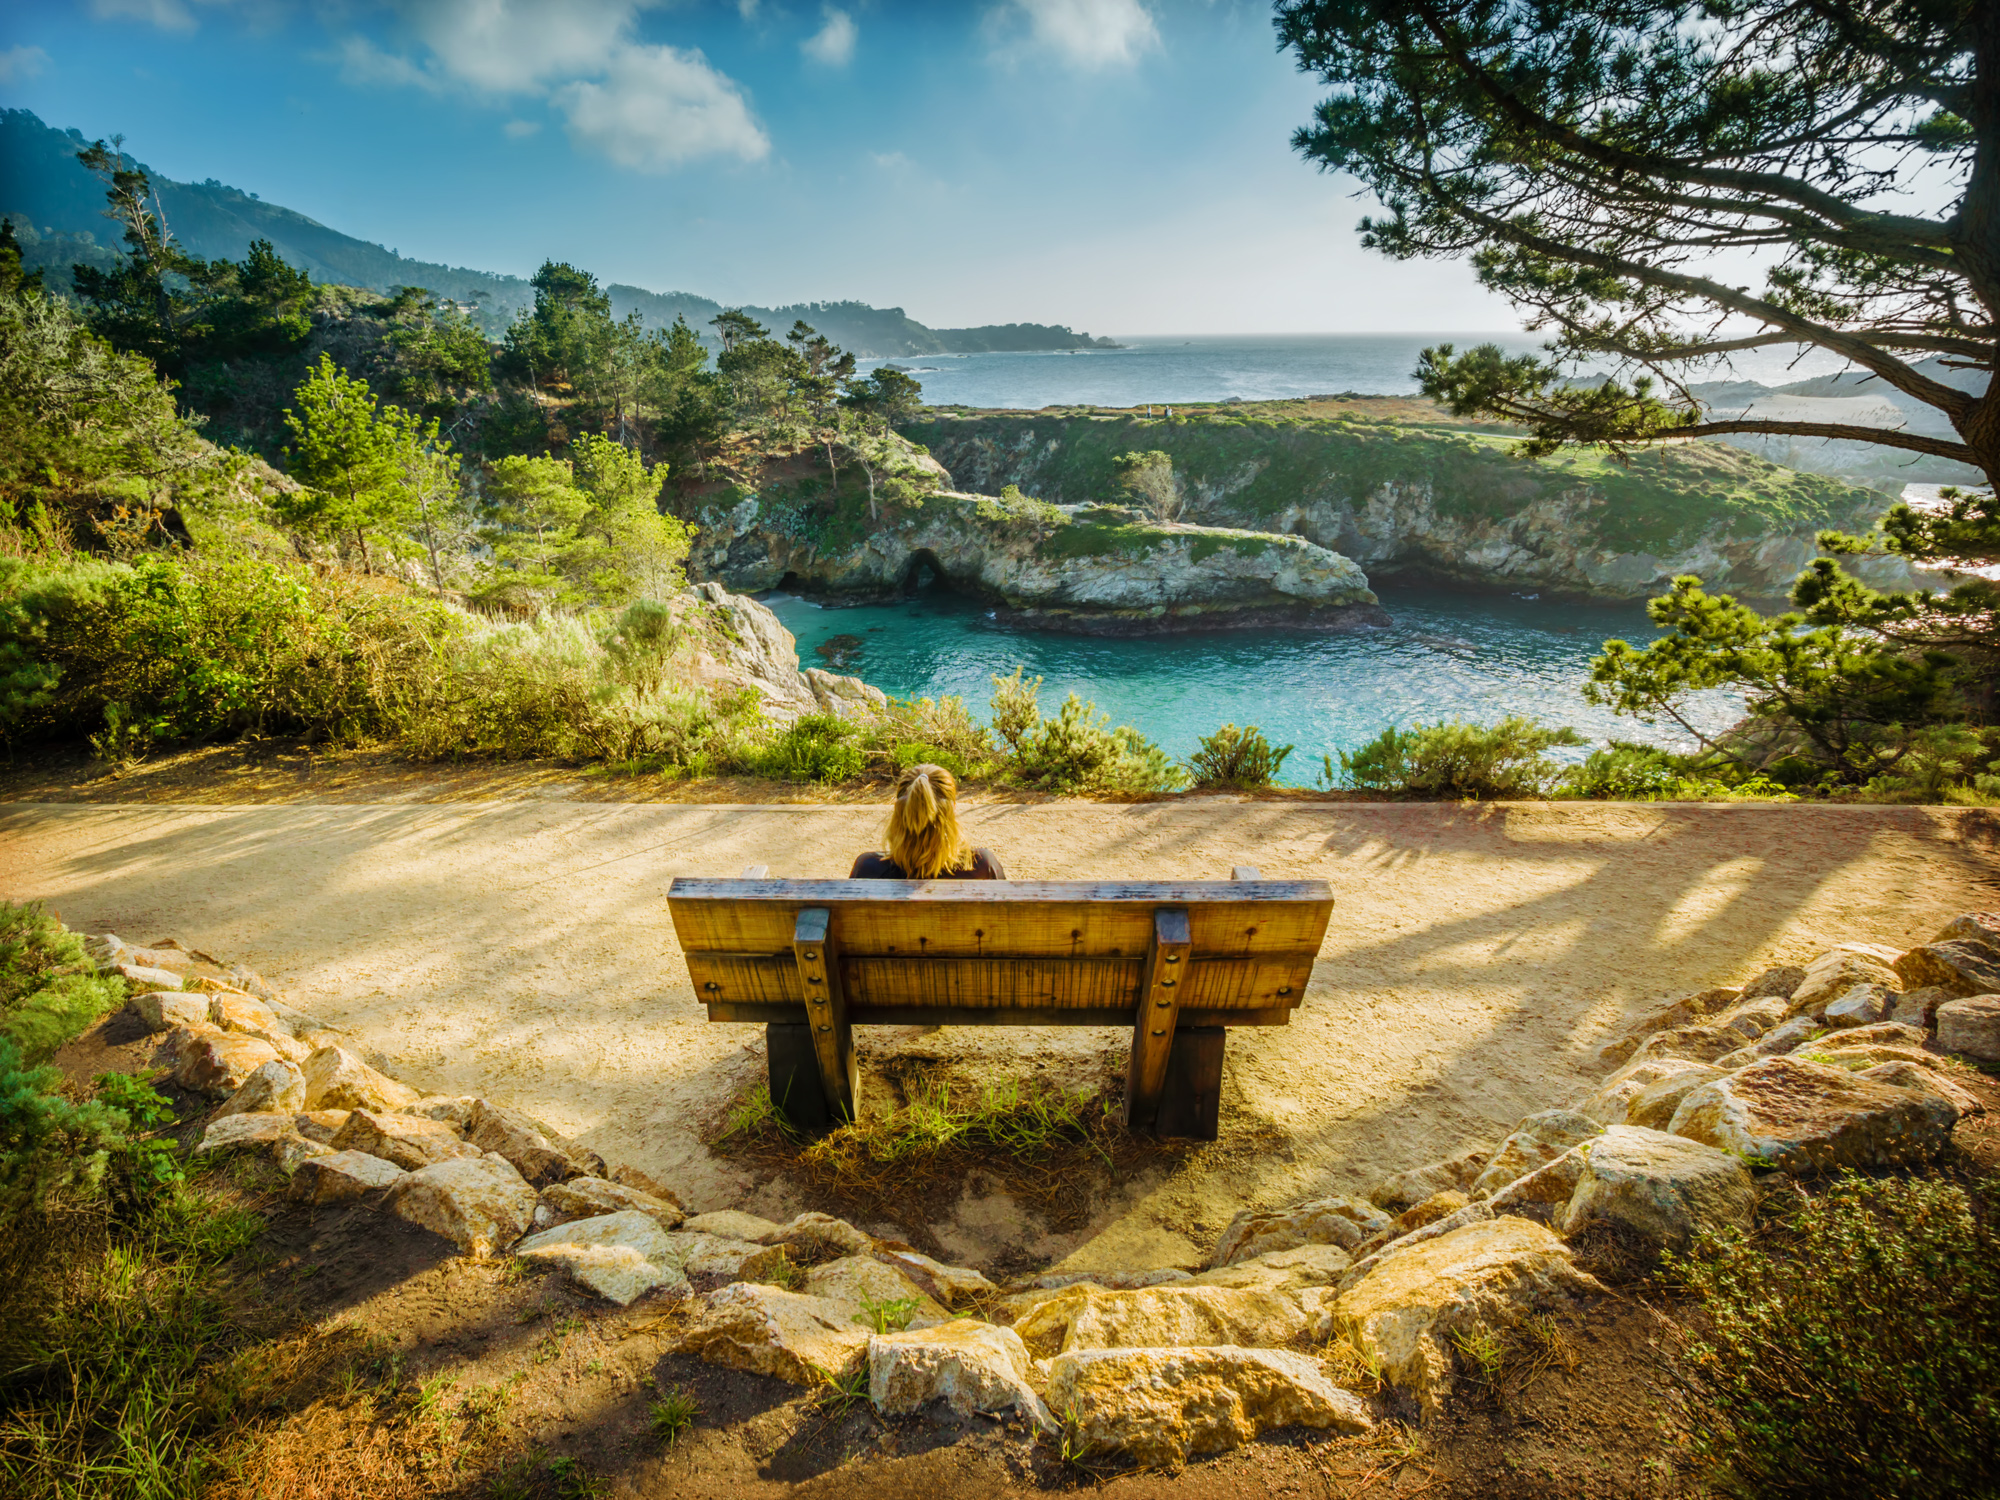 China Cove (Point Lobos), USA